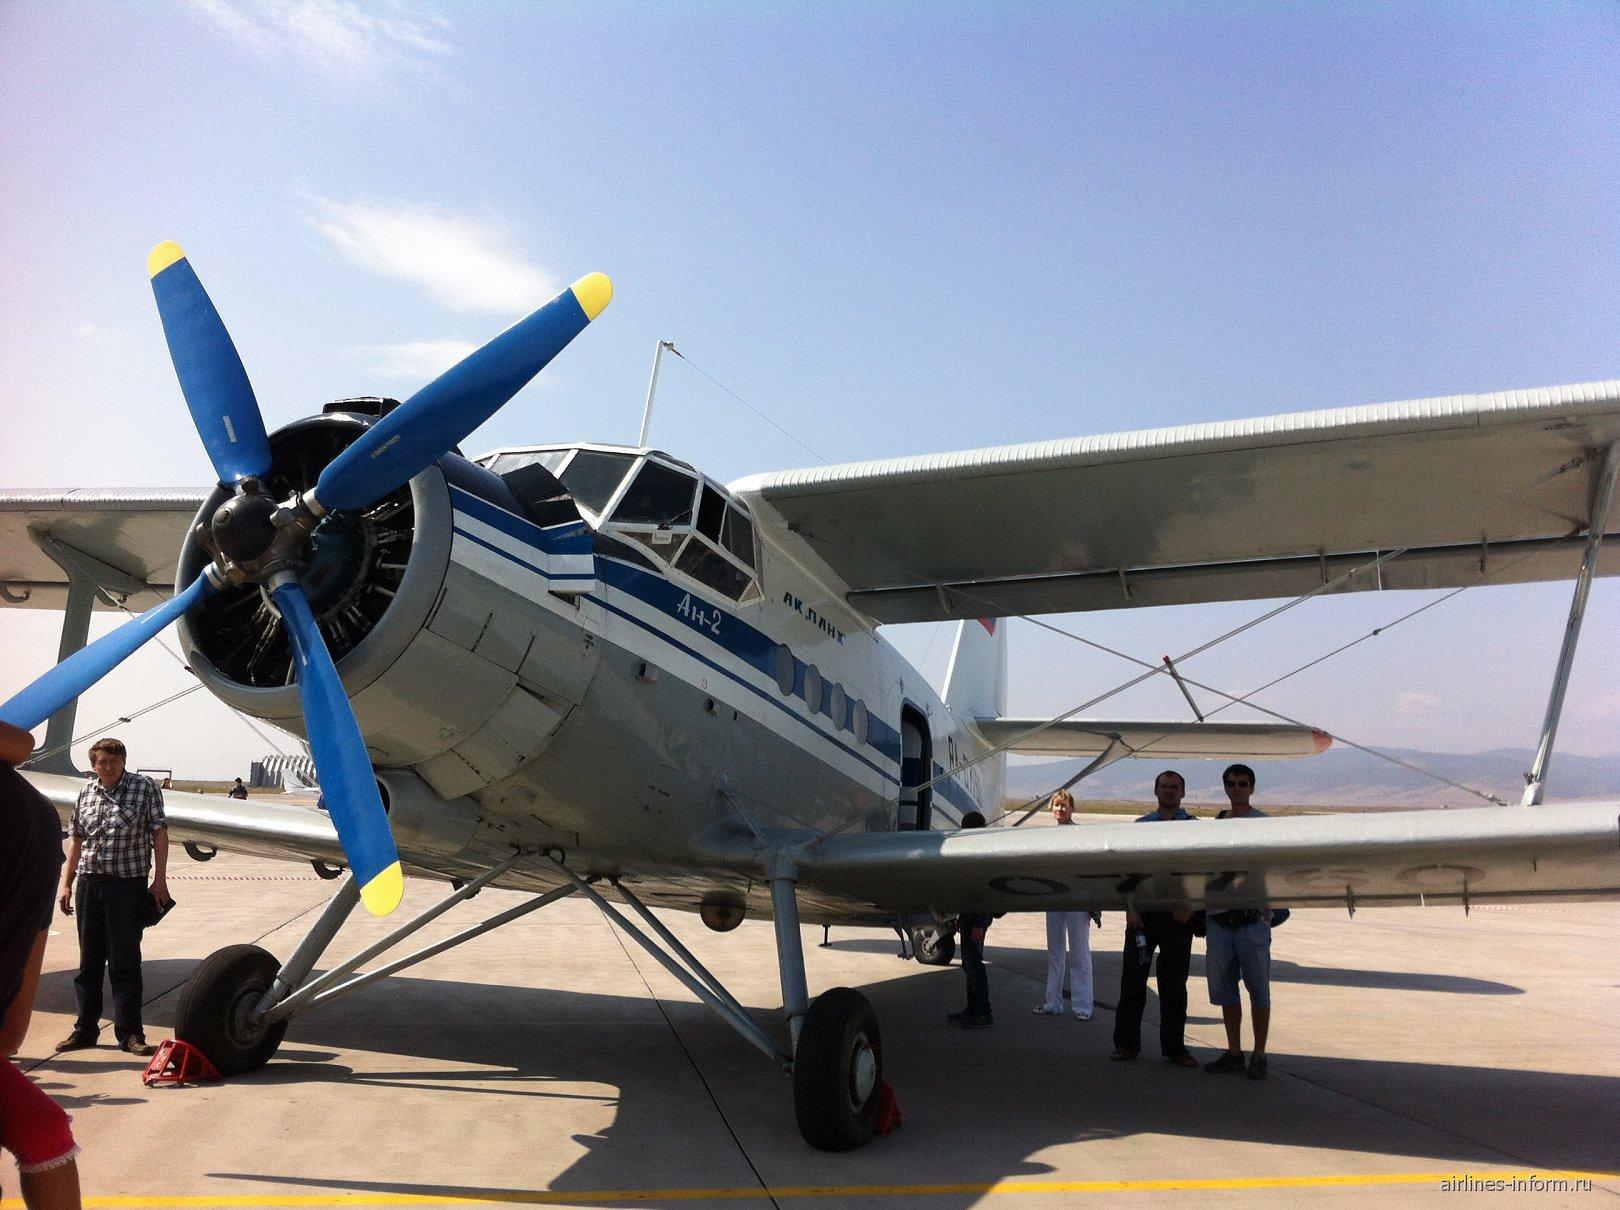 Самолет Ан-2 авиакомпании ПАНХ